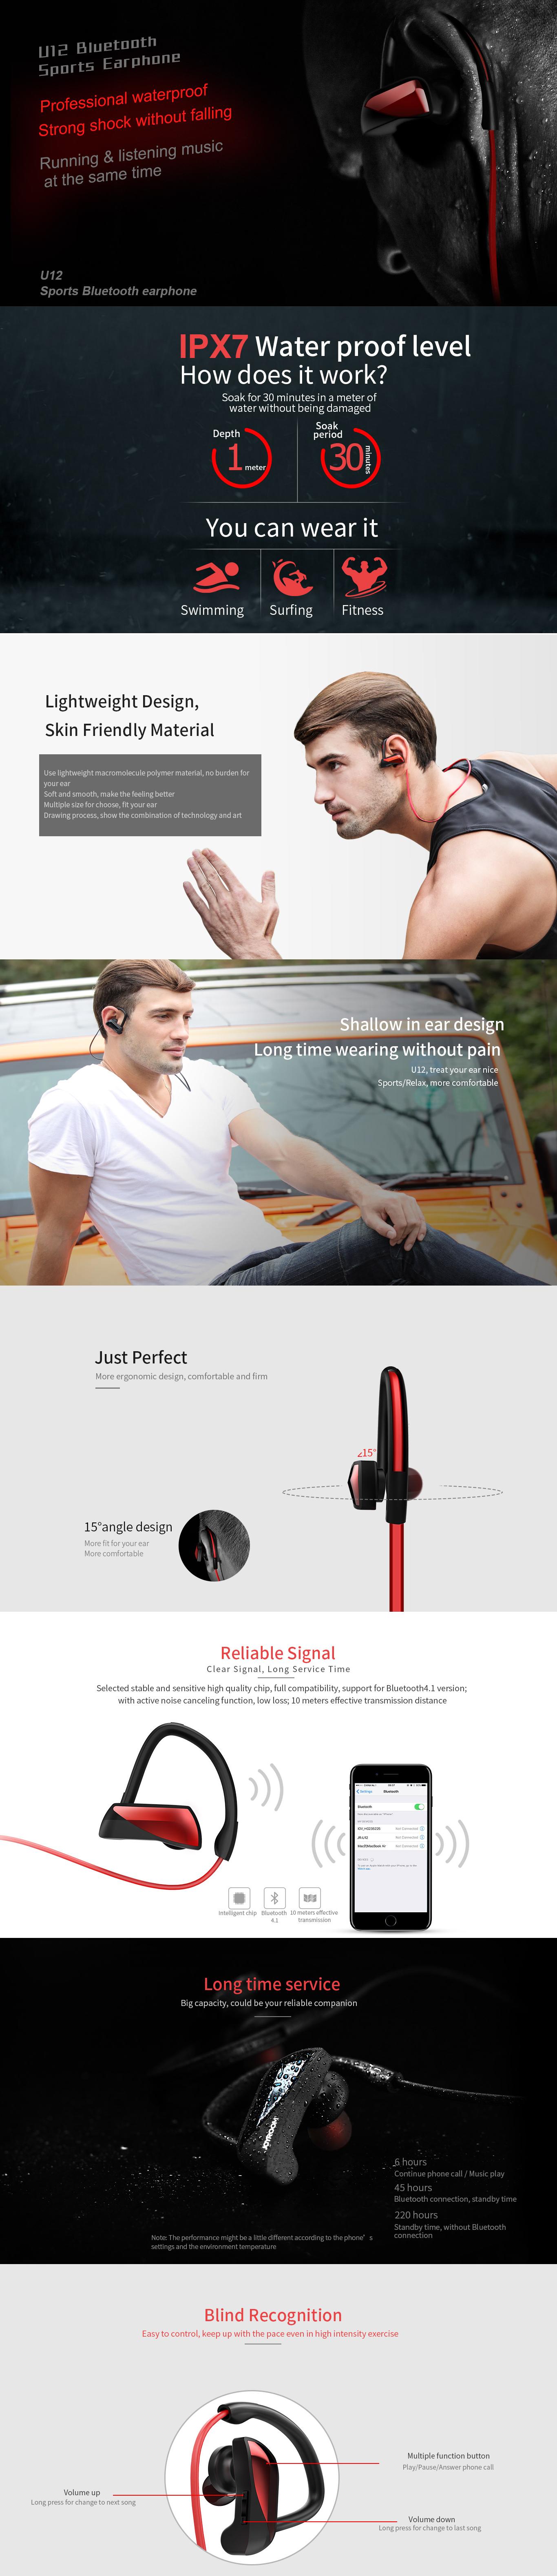 Joyroom headphone price in bangladesh